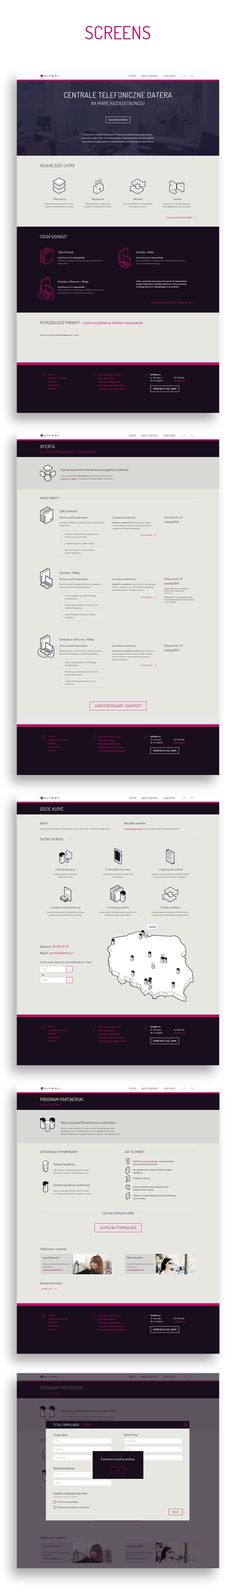 DATERA SA - Web Design on Behance